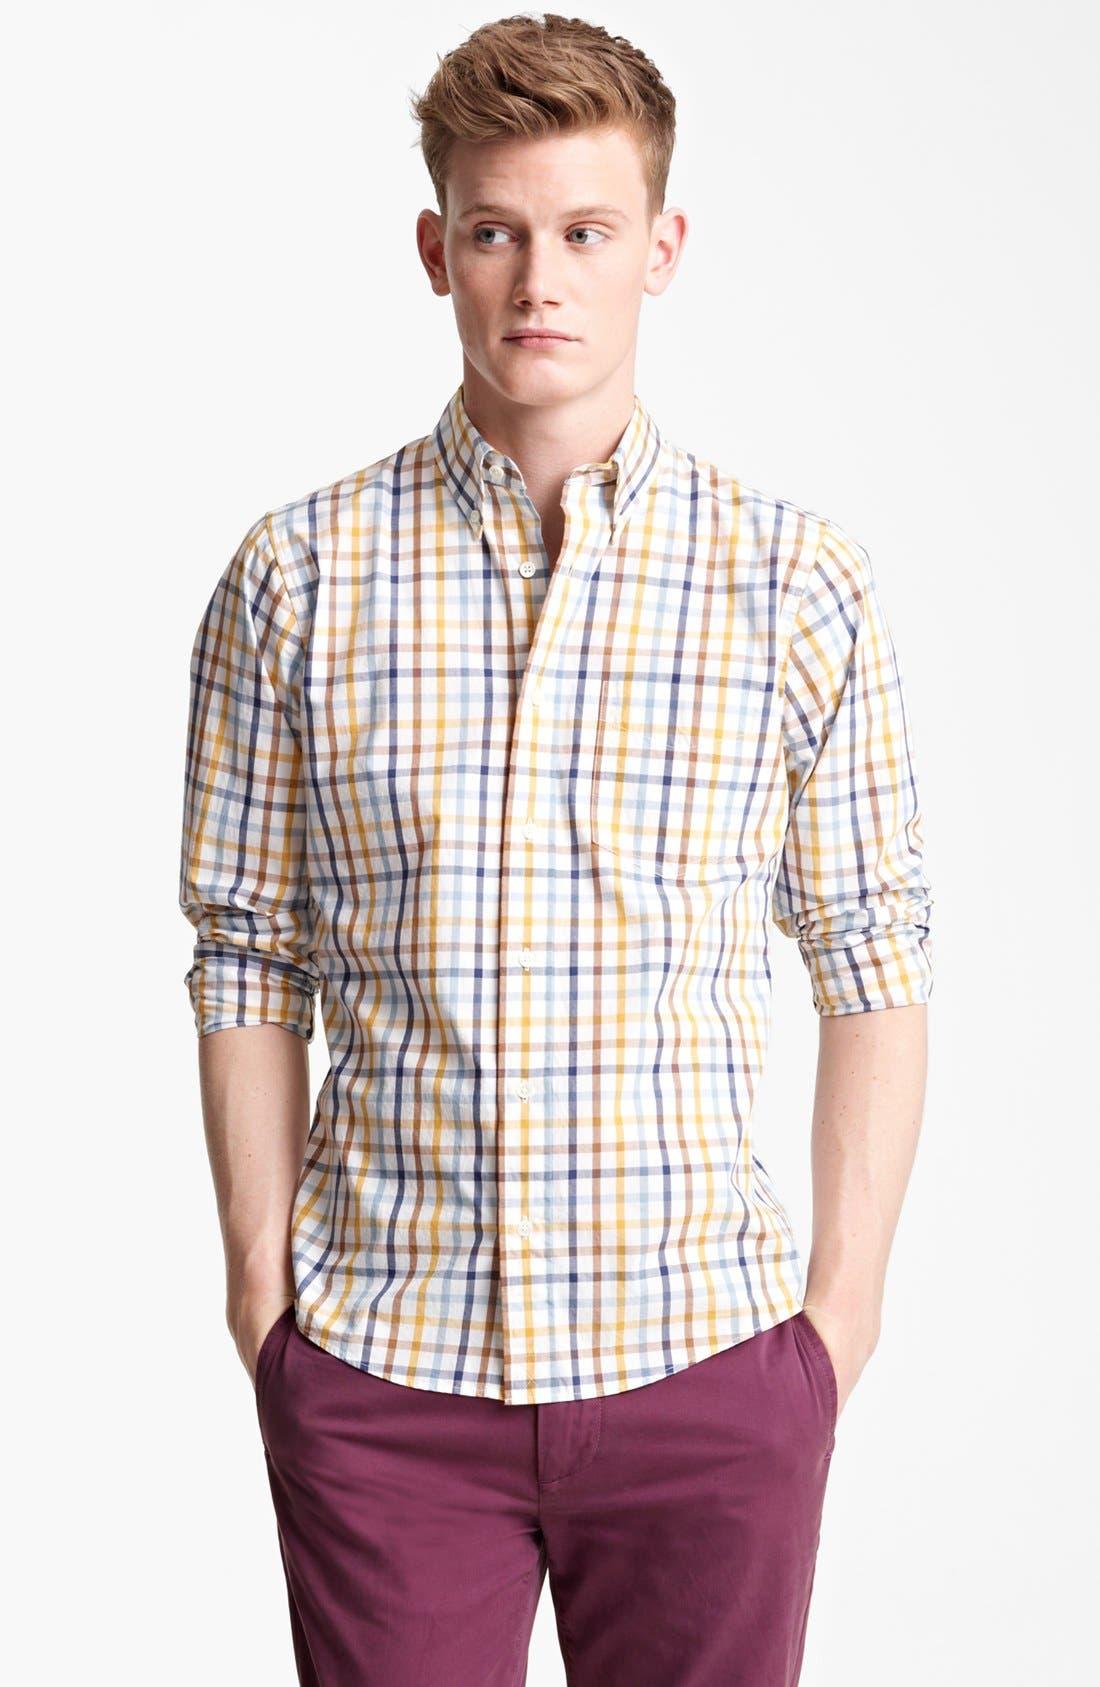 Alternate Image 1 Selected - Jack Spade 'Popson' Check Sport Shirt